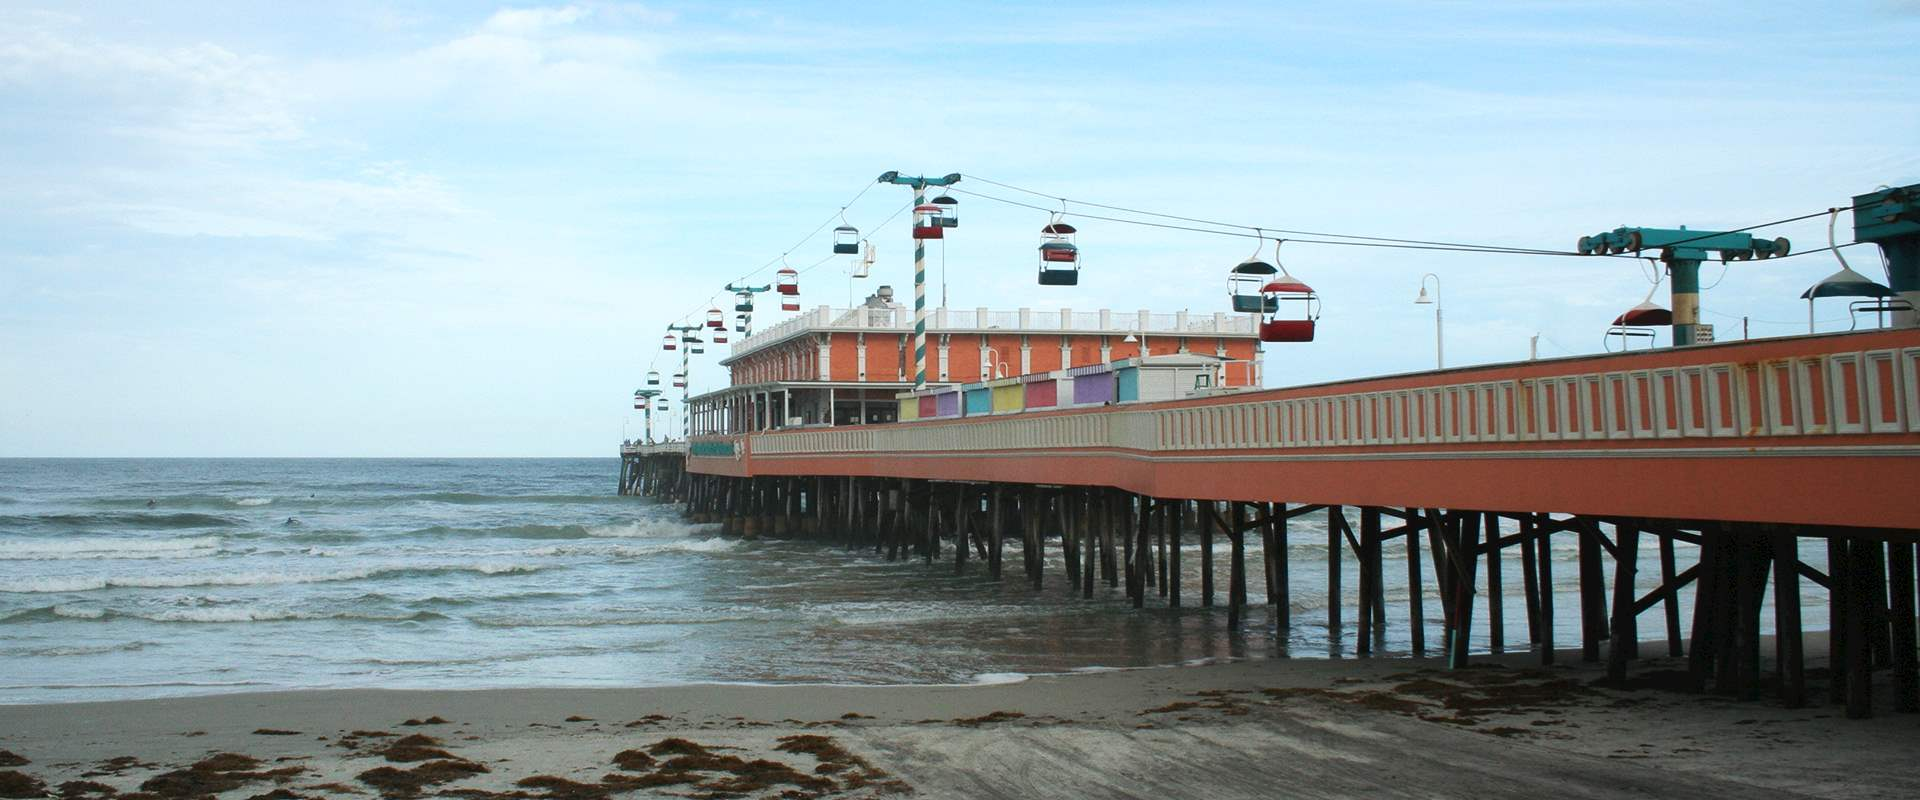 Boardwalk of Daytona Beach, Florida